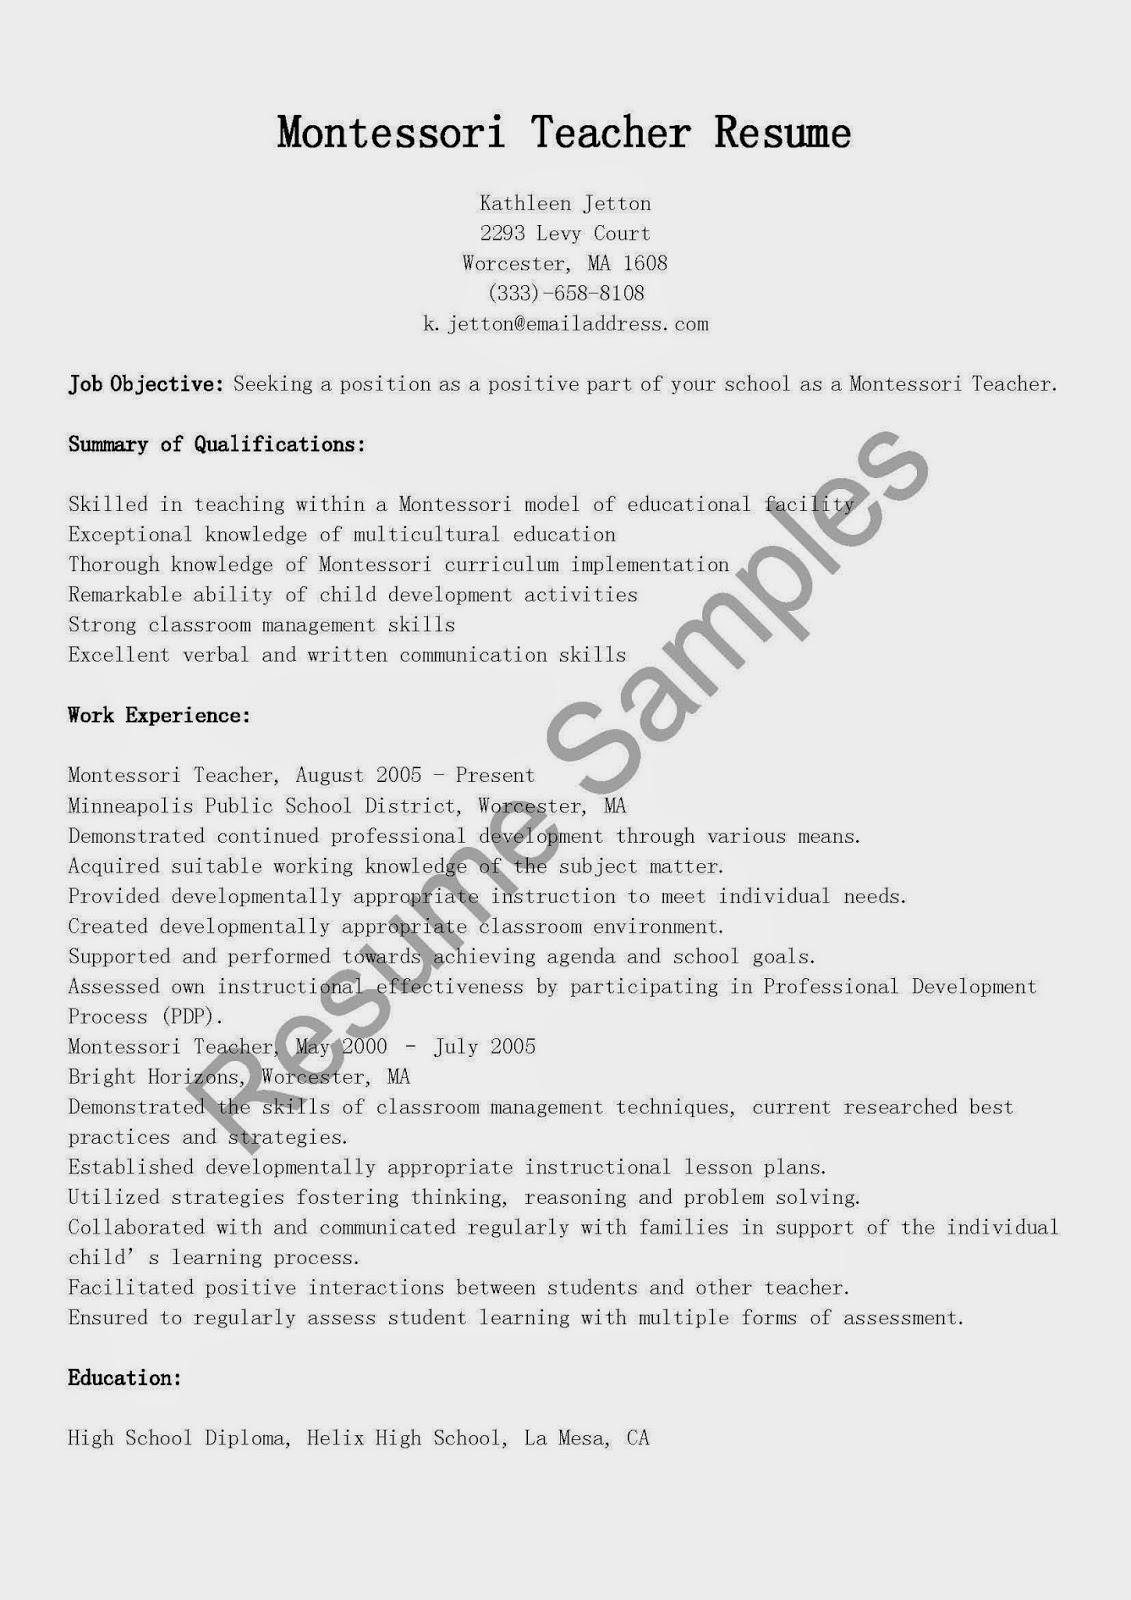 Resume Samples Montessori Teacher Resume Sample